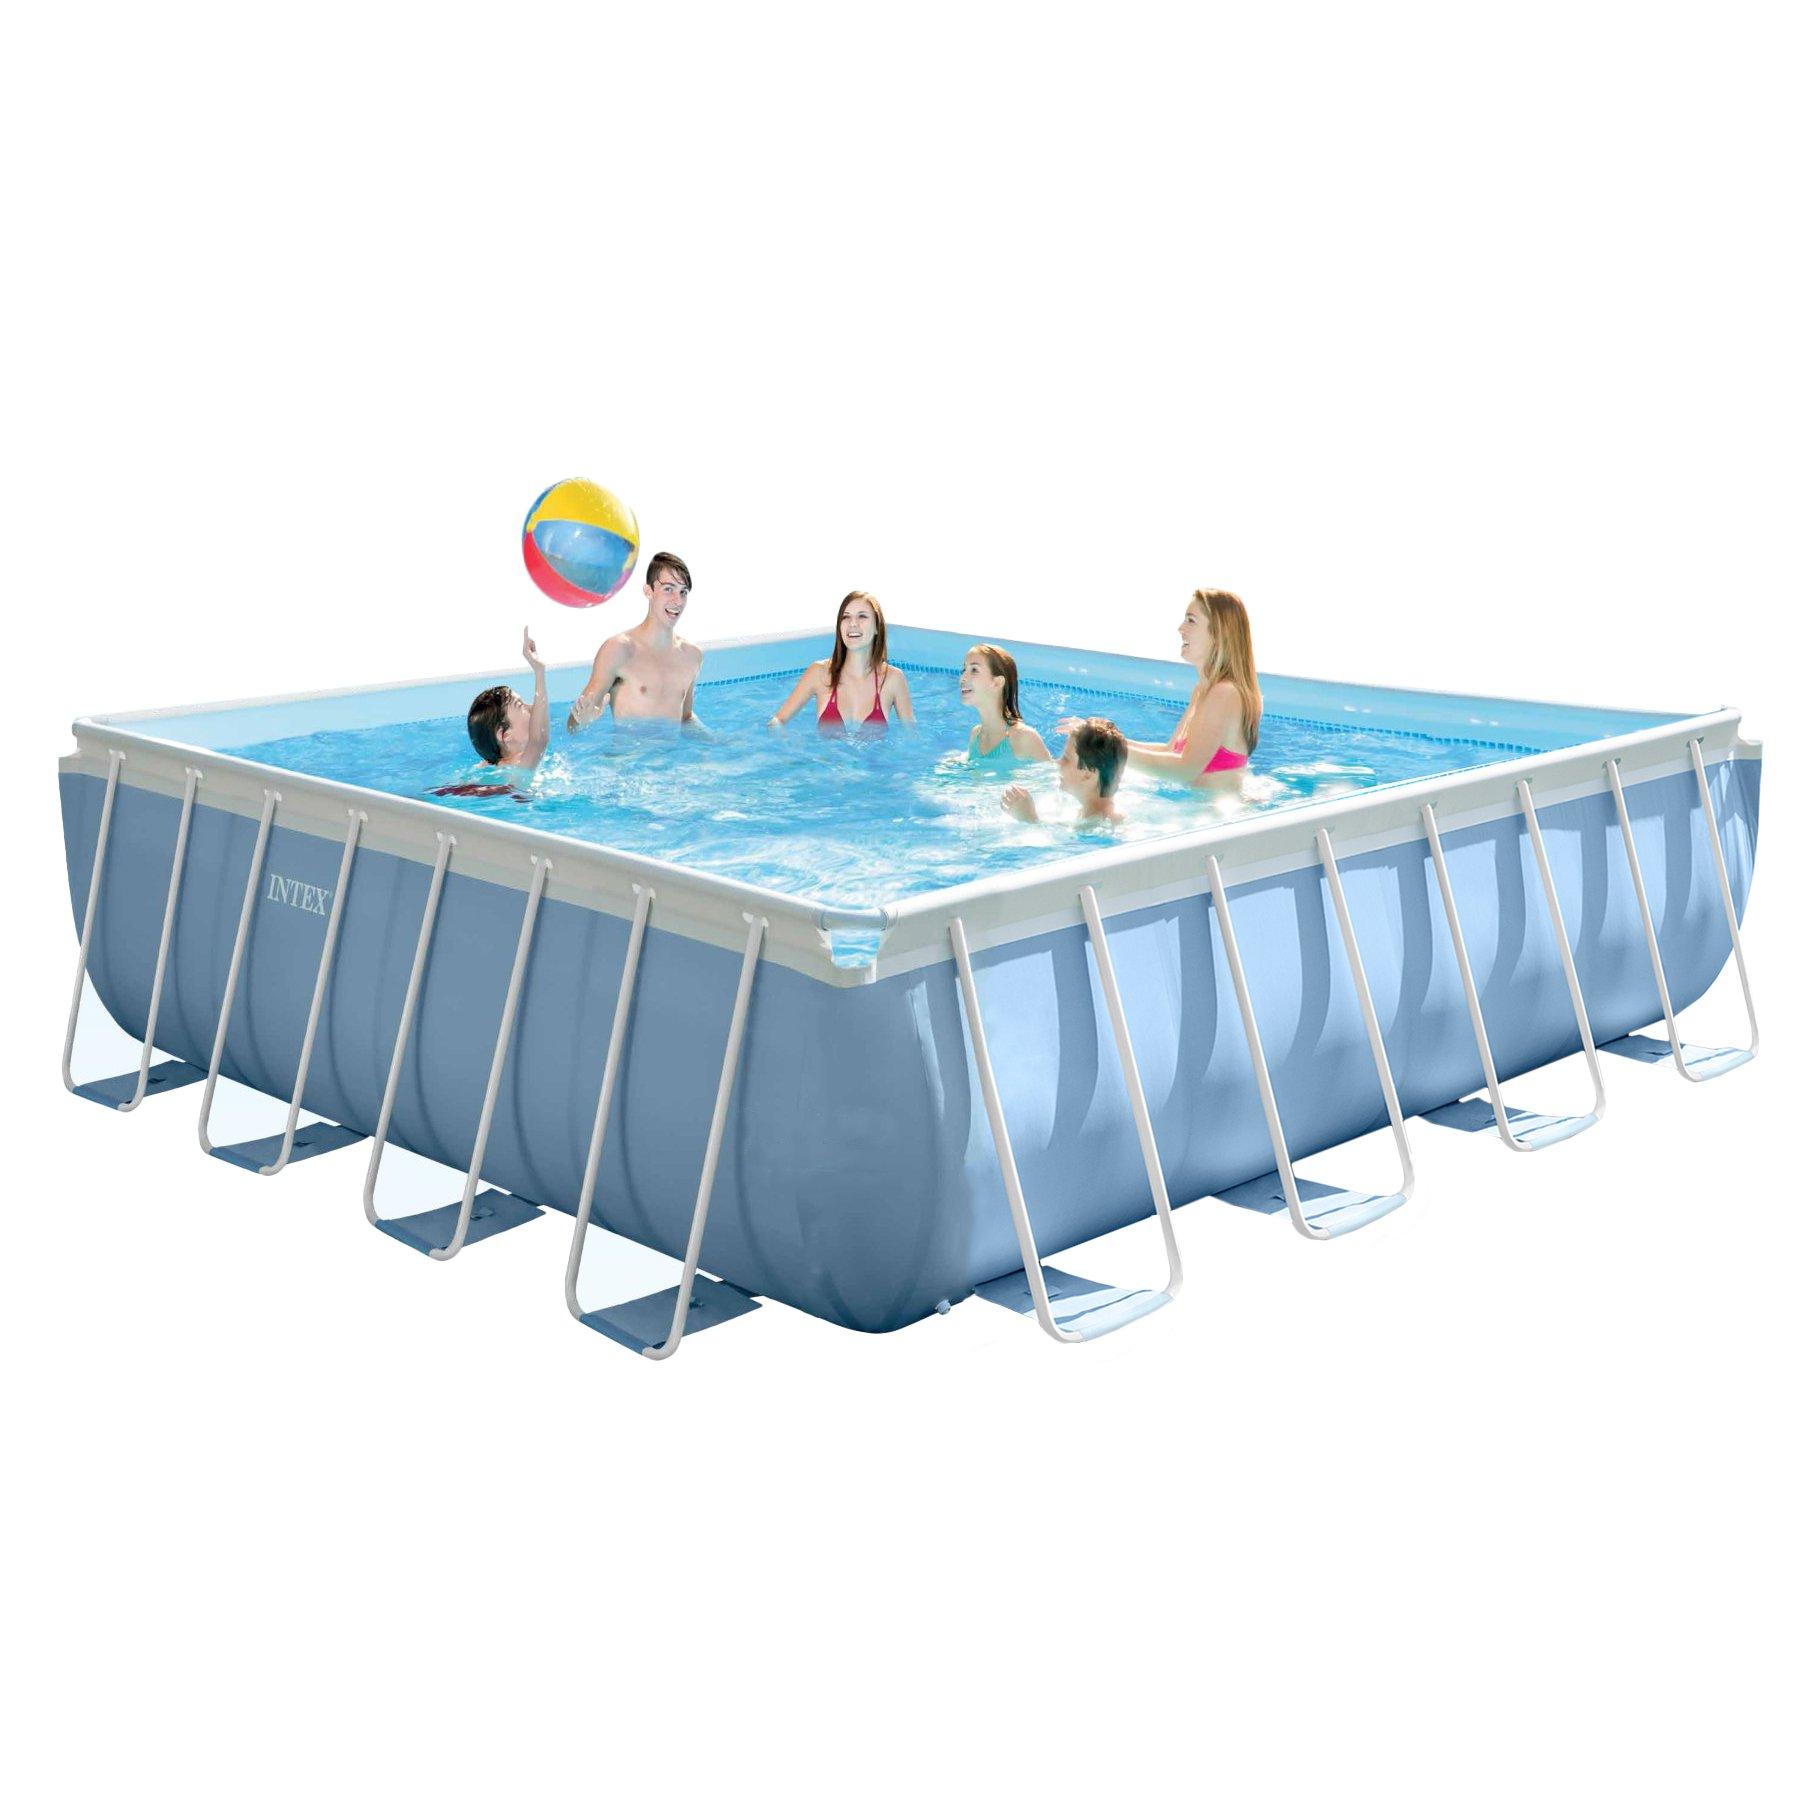 Above Ground Pool Clearance - Walmart.com